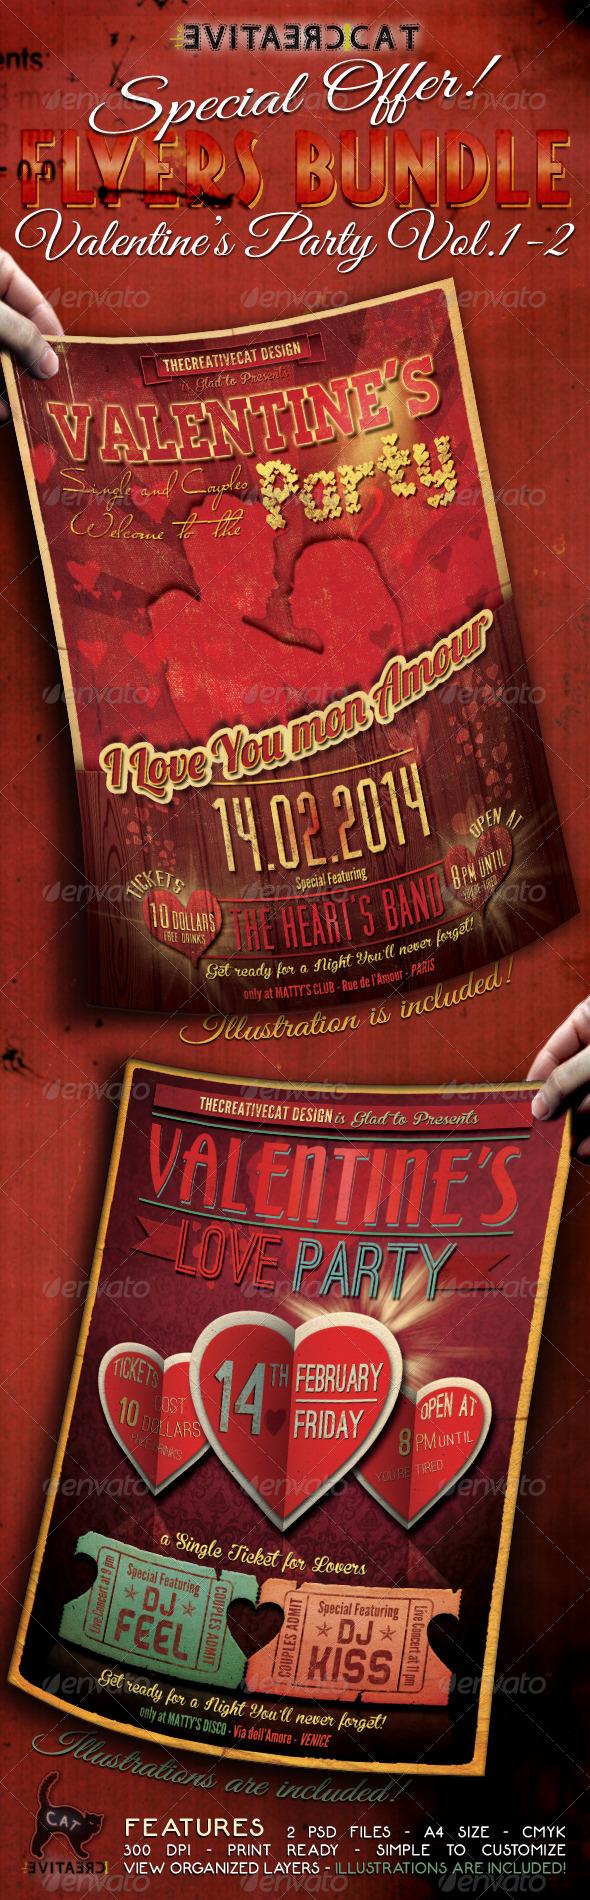 GraphicRiver Valentine s Party Flyer Poster Bundle Vol 1-2 6645065